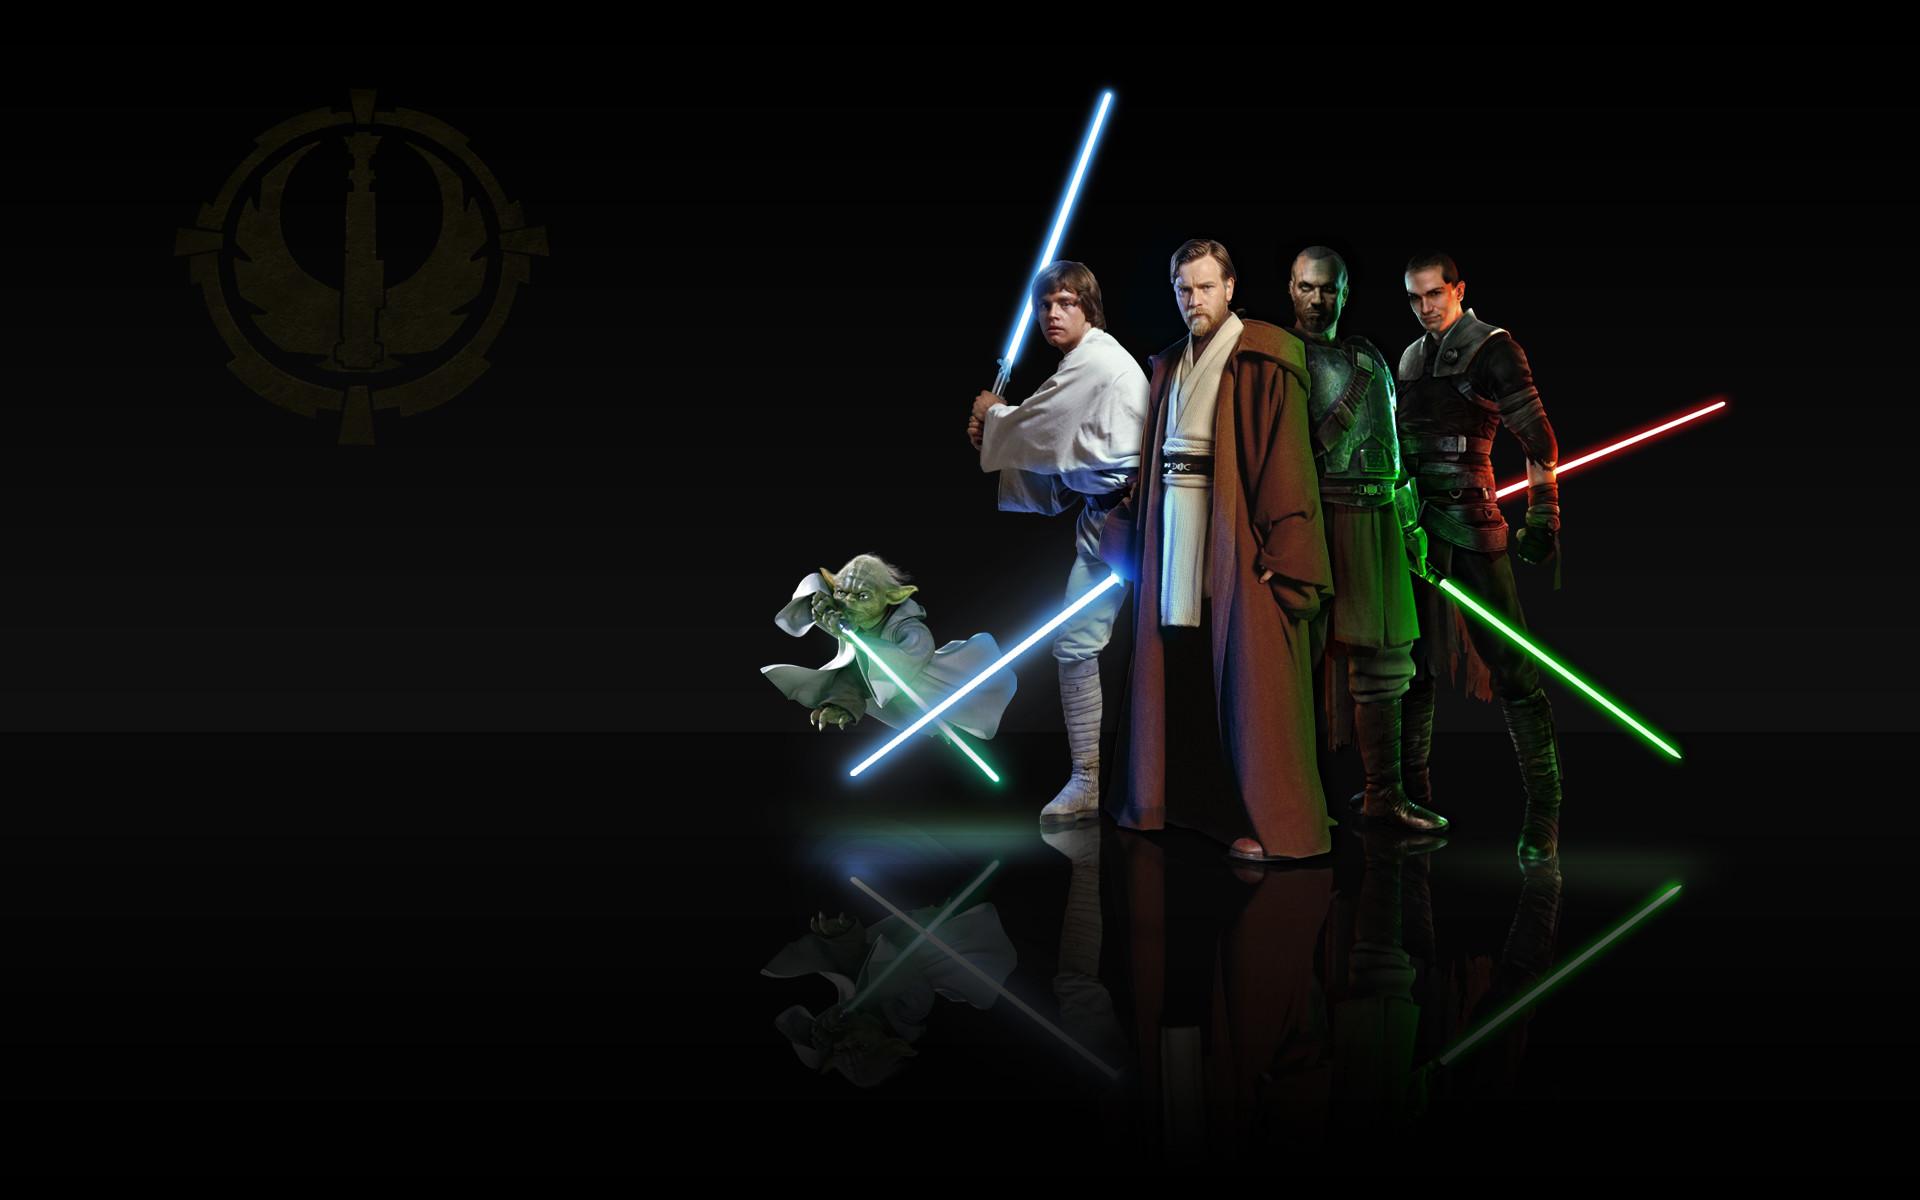 Star Wars | Star wars Wallpaper Image HD Wallpapers Free Movie